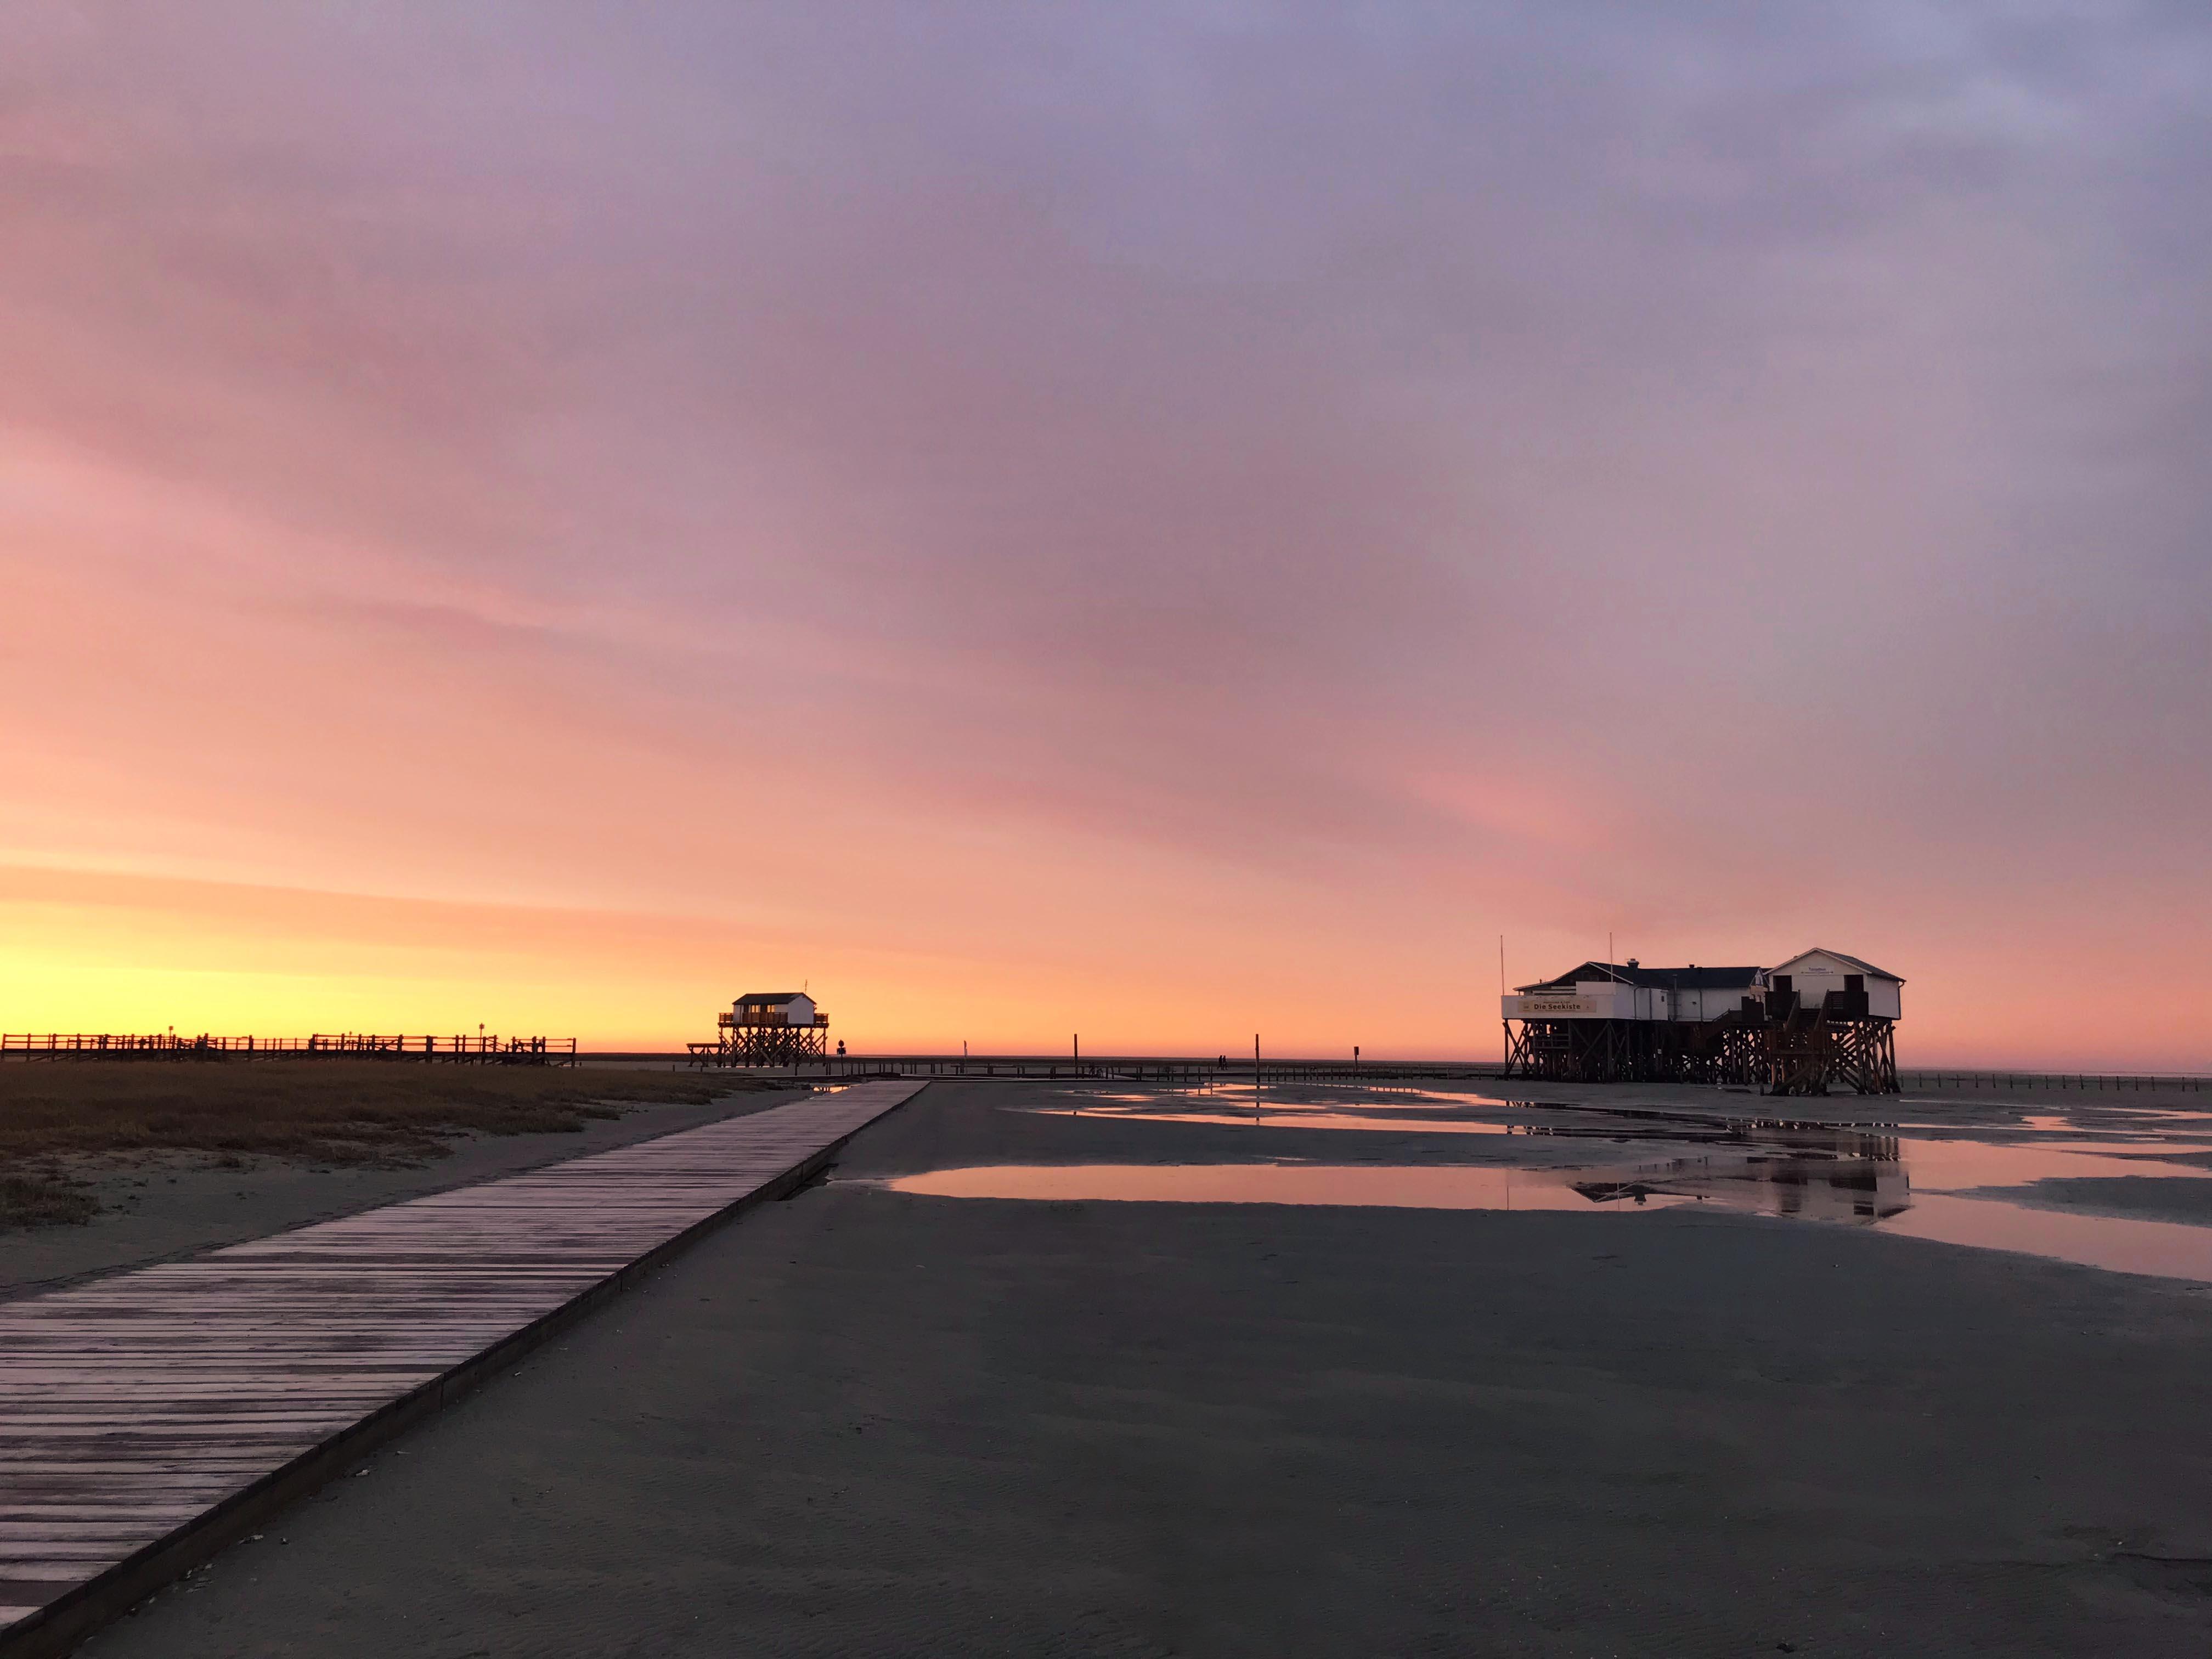 tz-spo-strand-boehl-sonnenaufgang-2019-01-10-2